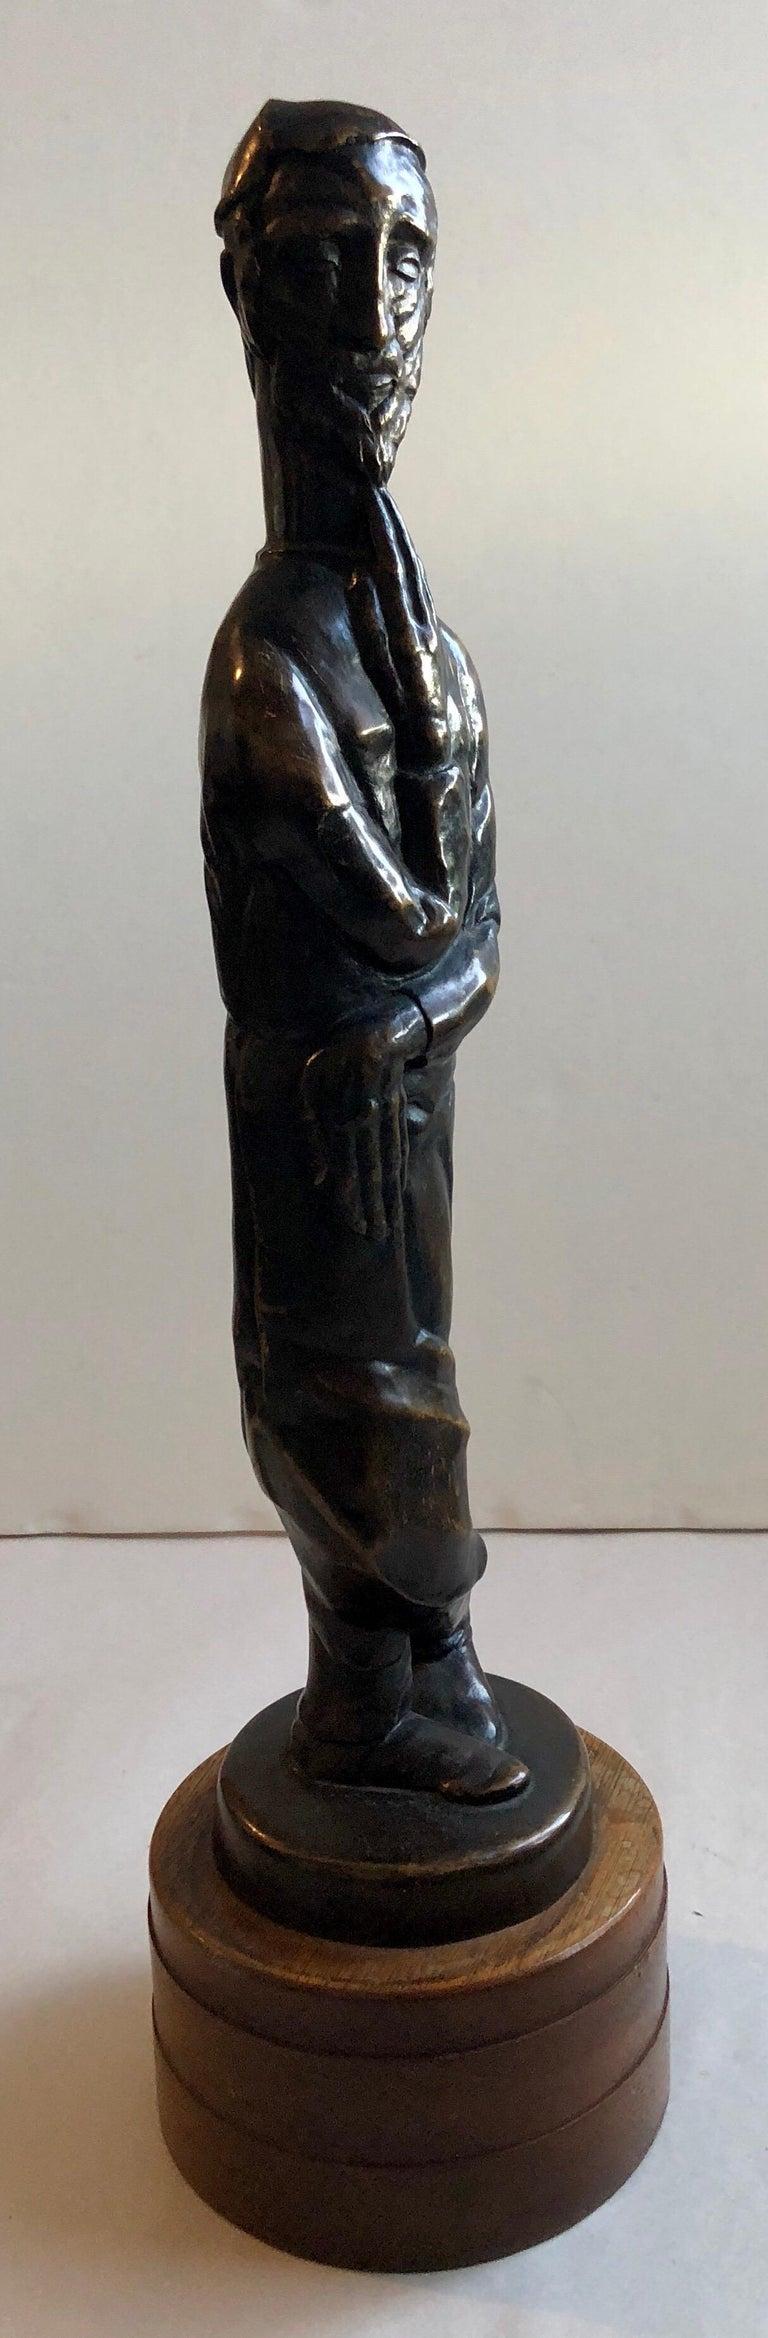 Art Deco Expressionist Bronze Judaica Rabbi Sculpture Los Angeles Modernist For Sale 8